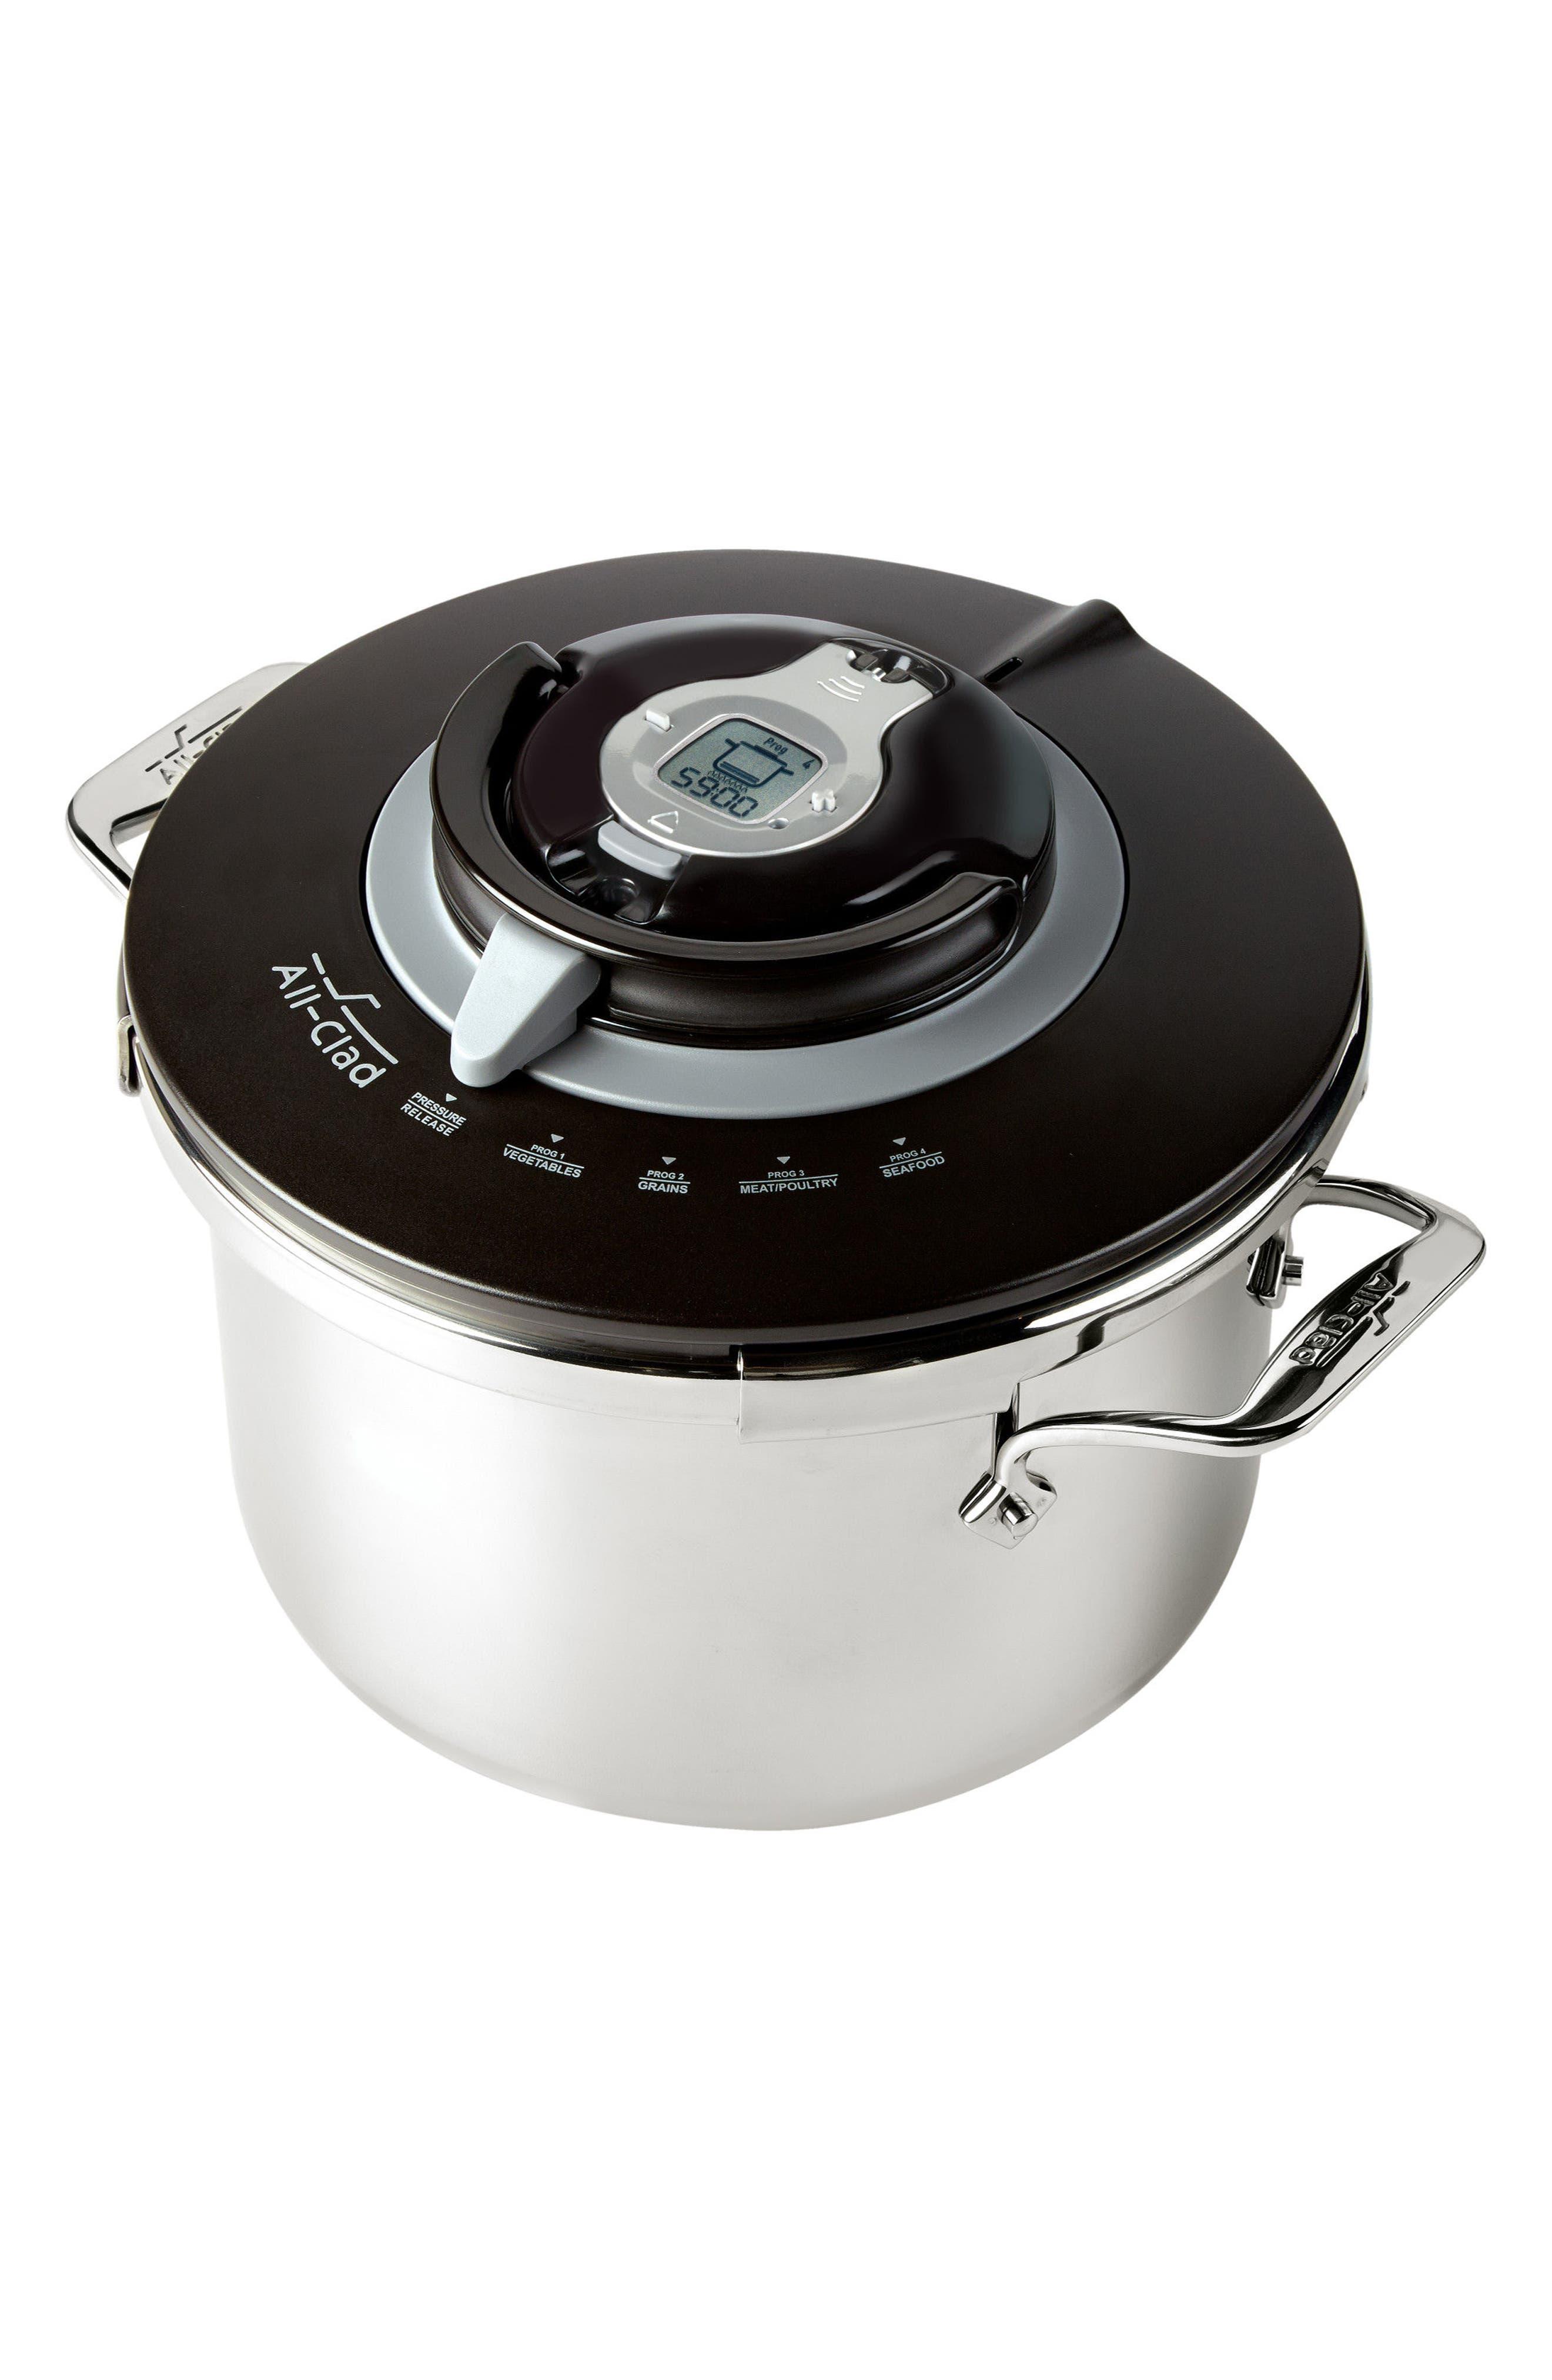 Alternate Image 2  - All-Clad 8.4-Quart Stovetop Pressure Cooker